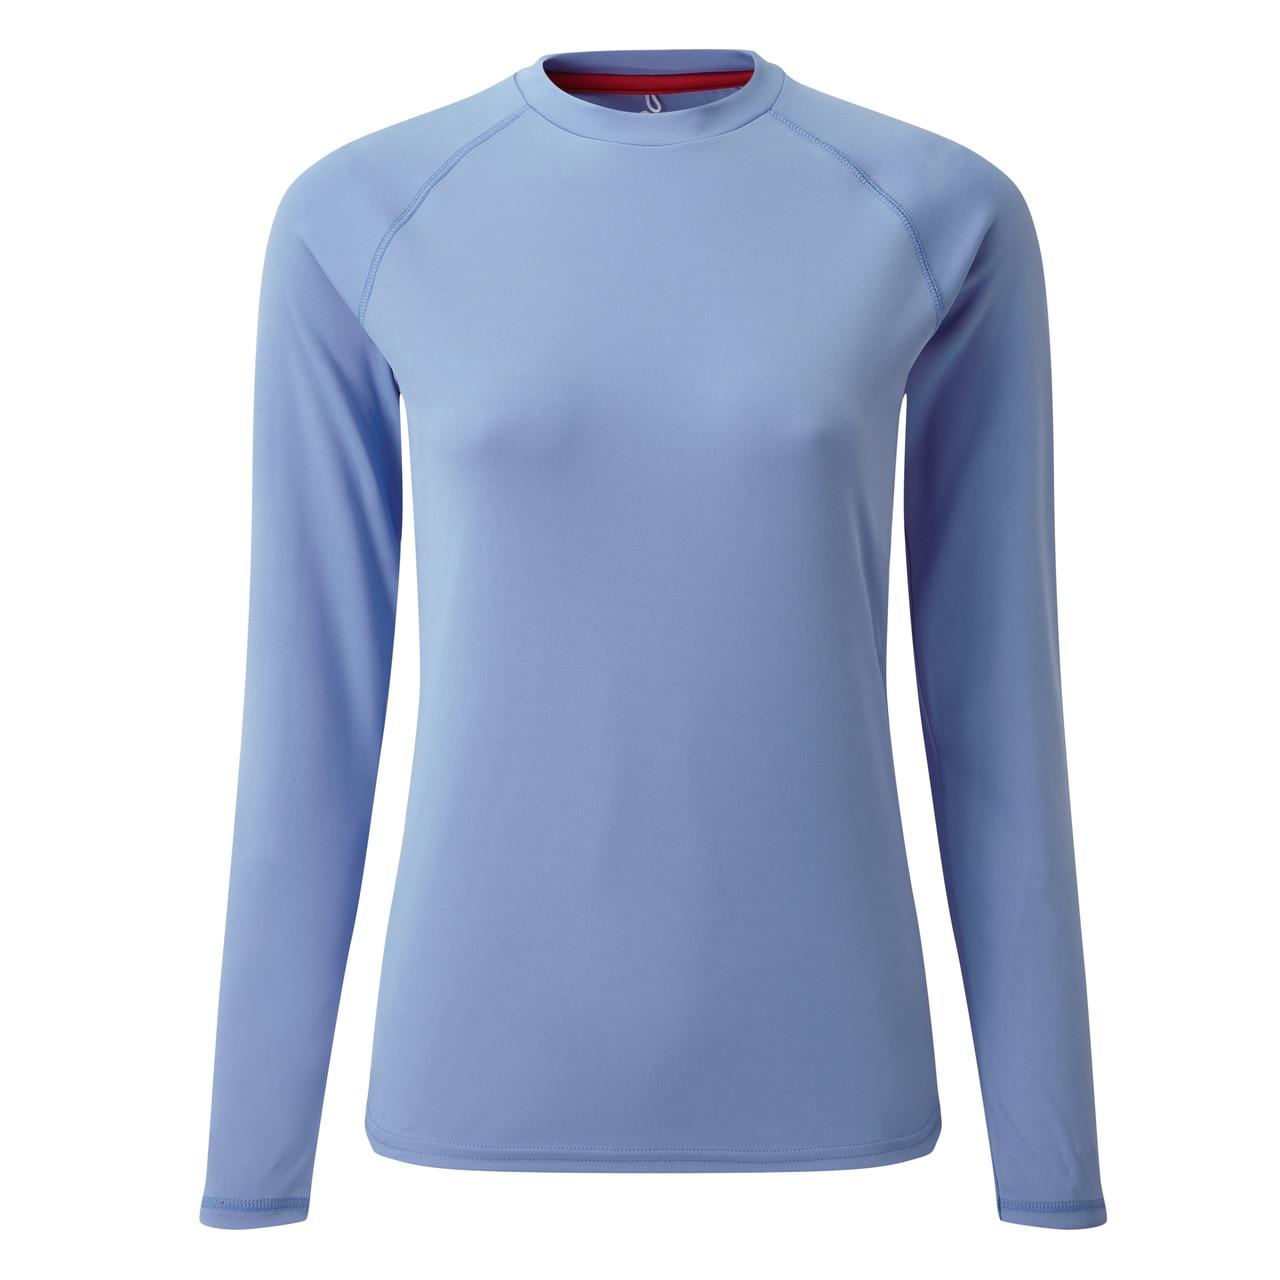 Women's UV Tec Long Sleeve Tee - UV011W-BLU18-1.jpg